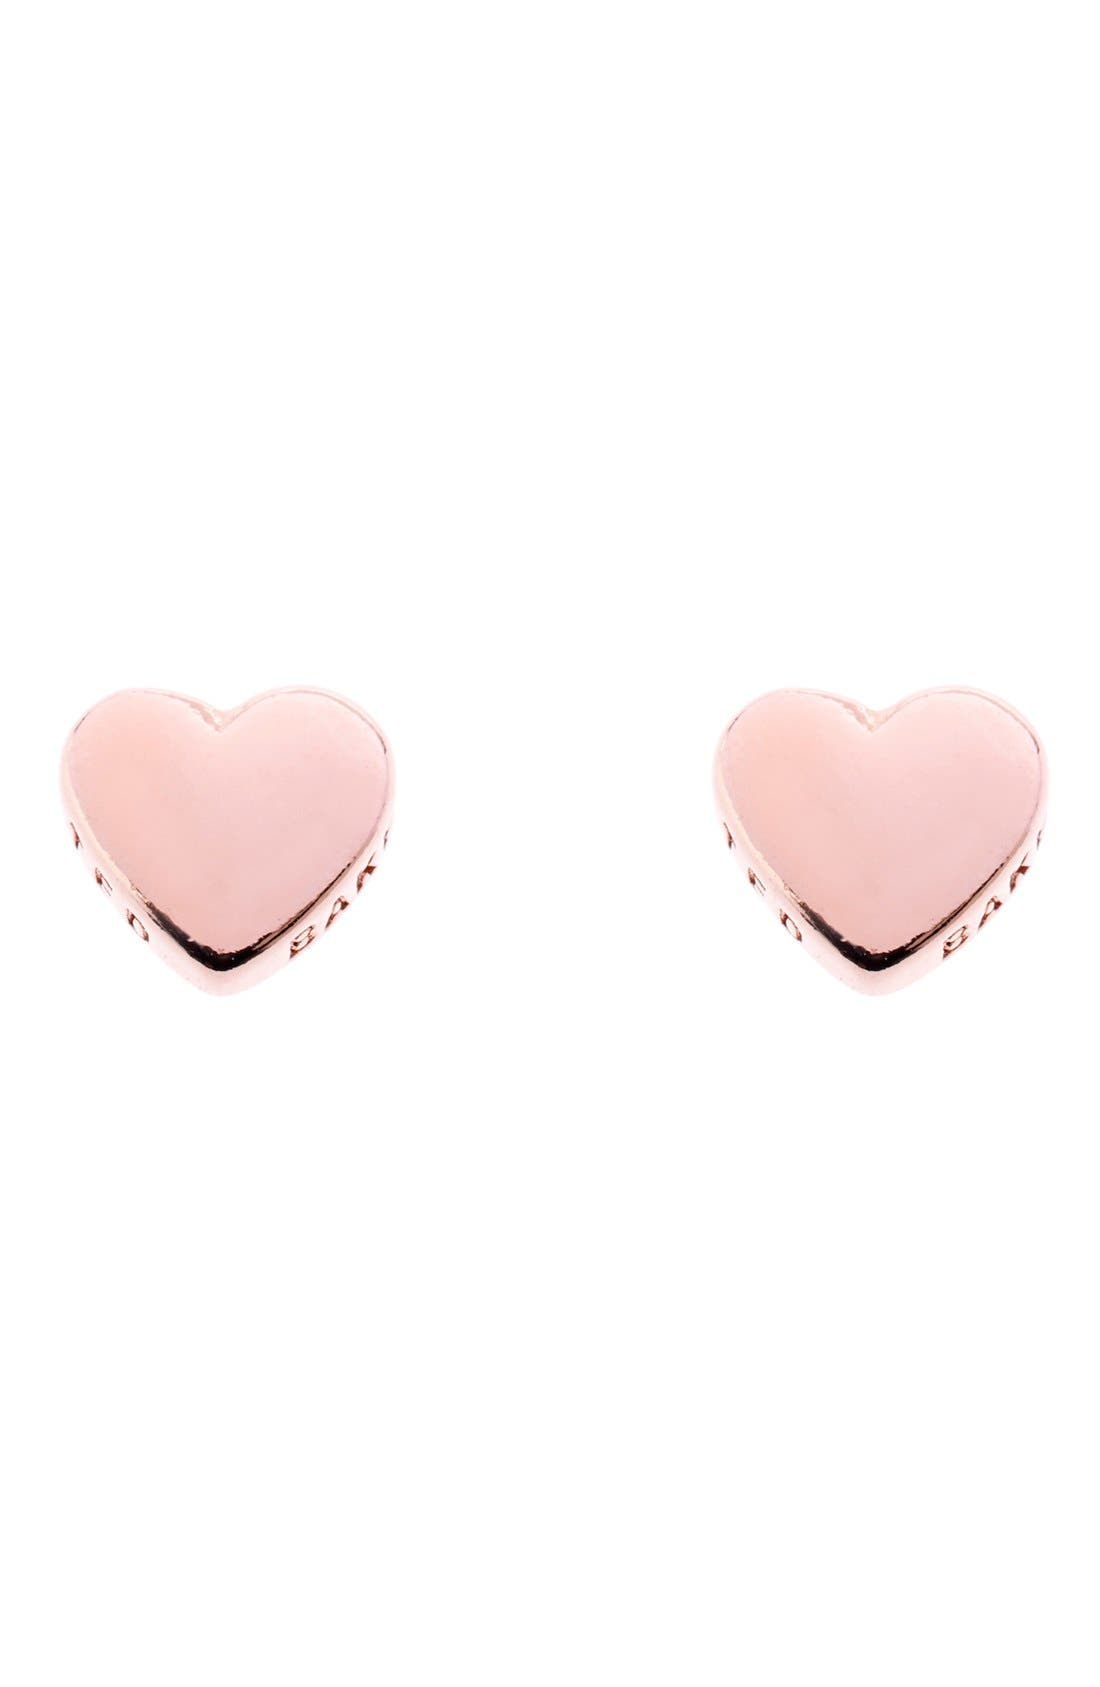 'Tiny Heart' Stud Earrings,                             Main thumbnail 1, color,                             Rose Gold